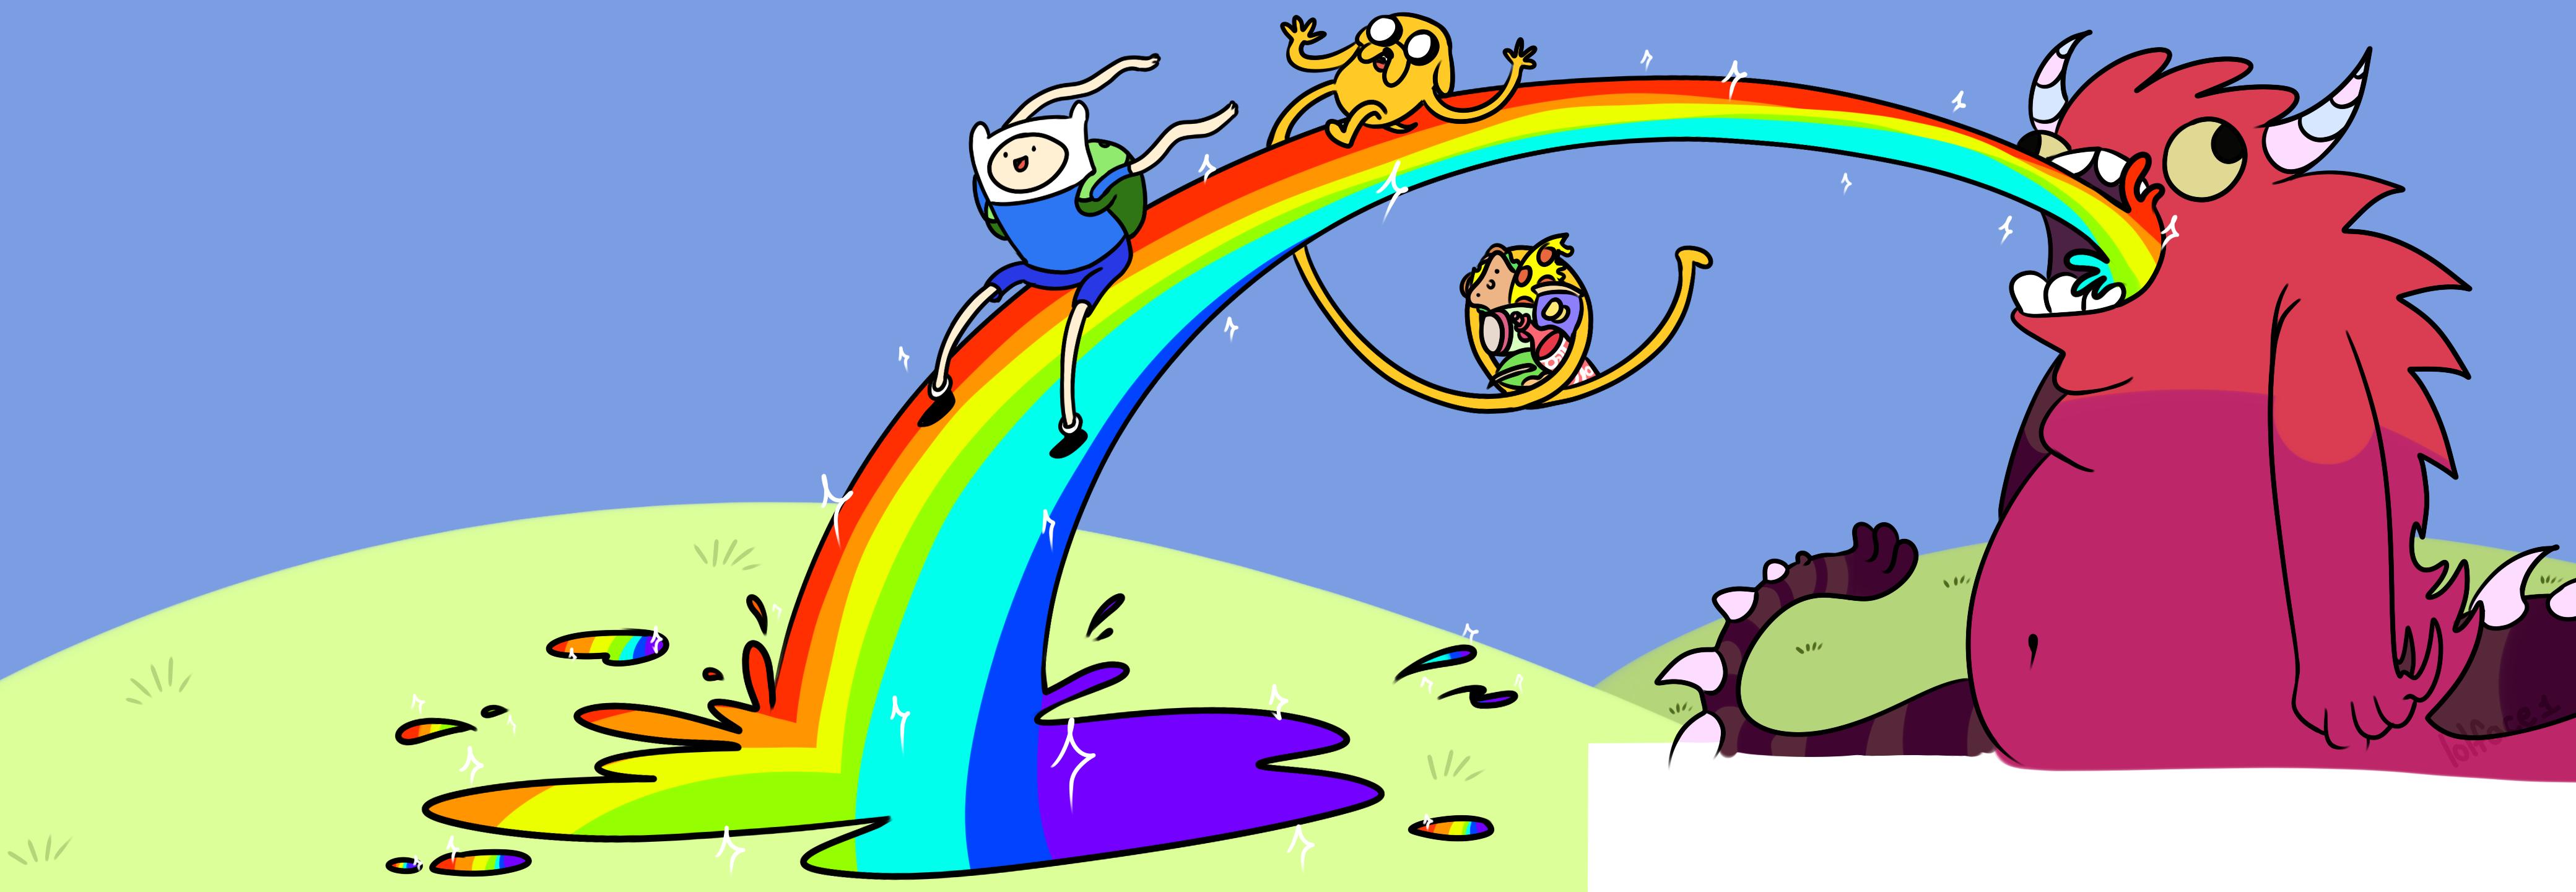 Adventure Time Dual Screen Wallpaper By Lolface1 On Deviantart